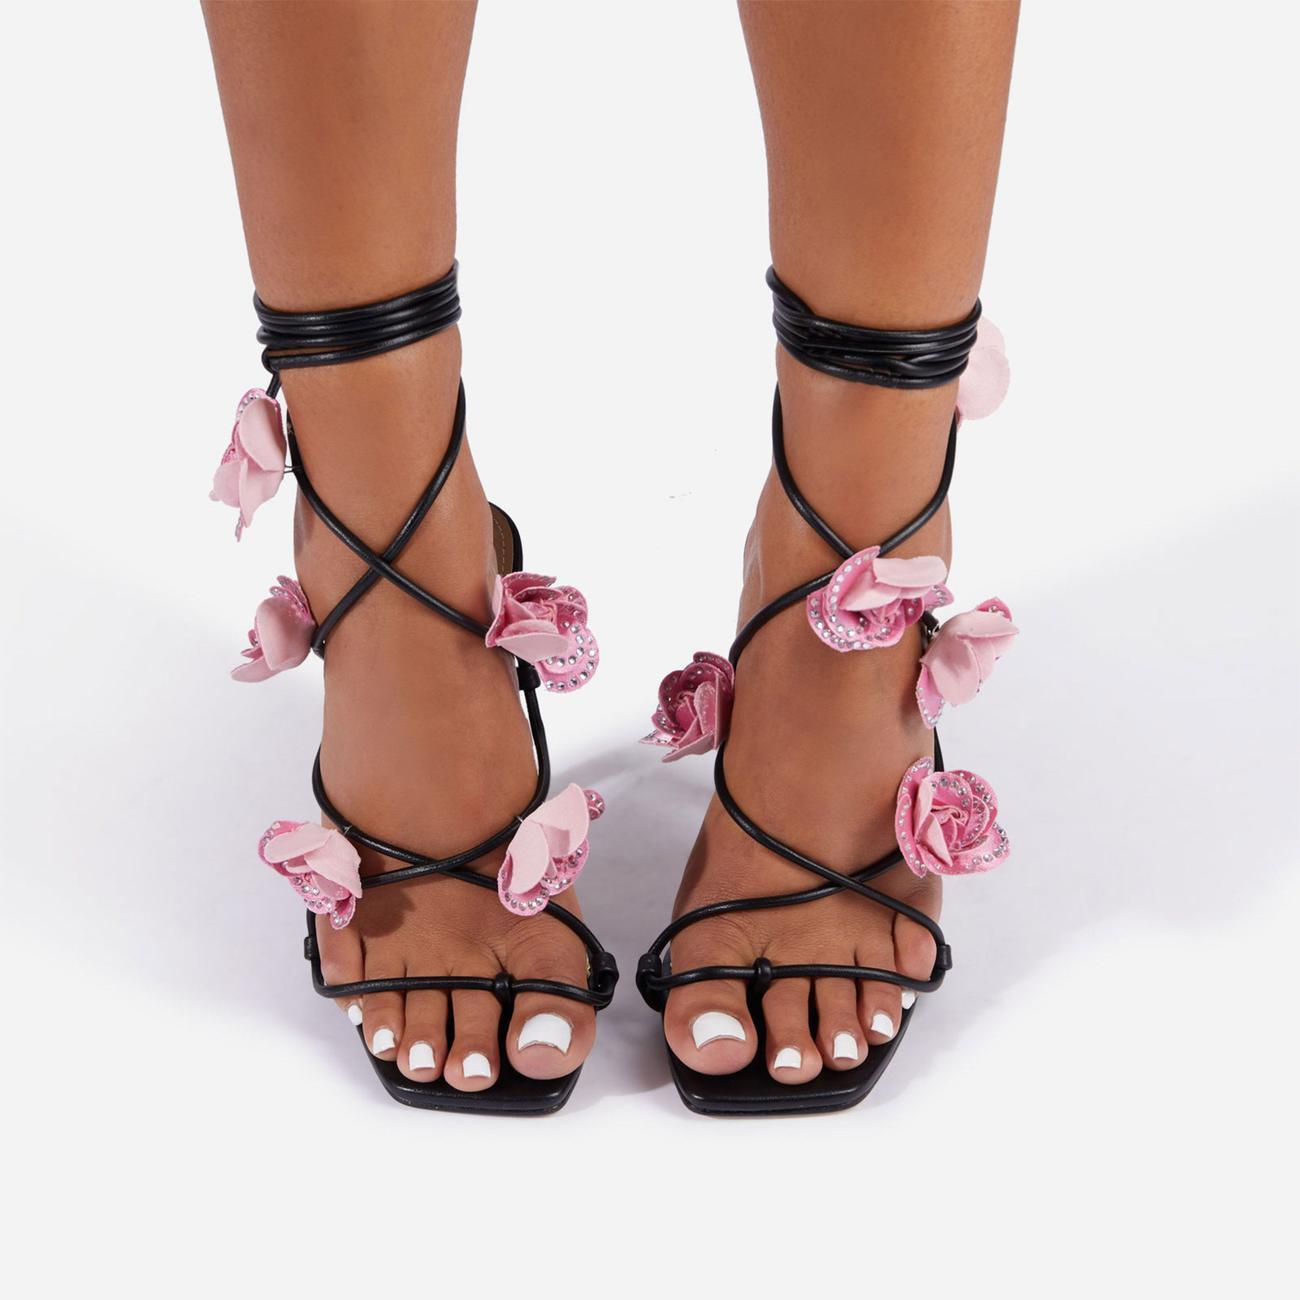 Rose Whip Embellished Floral Detail Lace Up Heel in Black Faux Leather Image 3